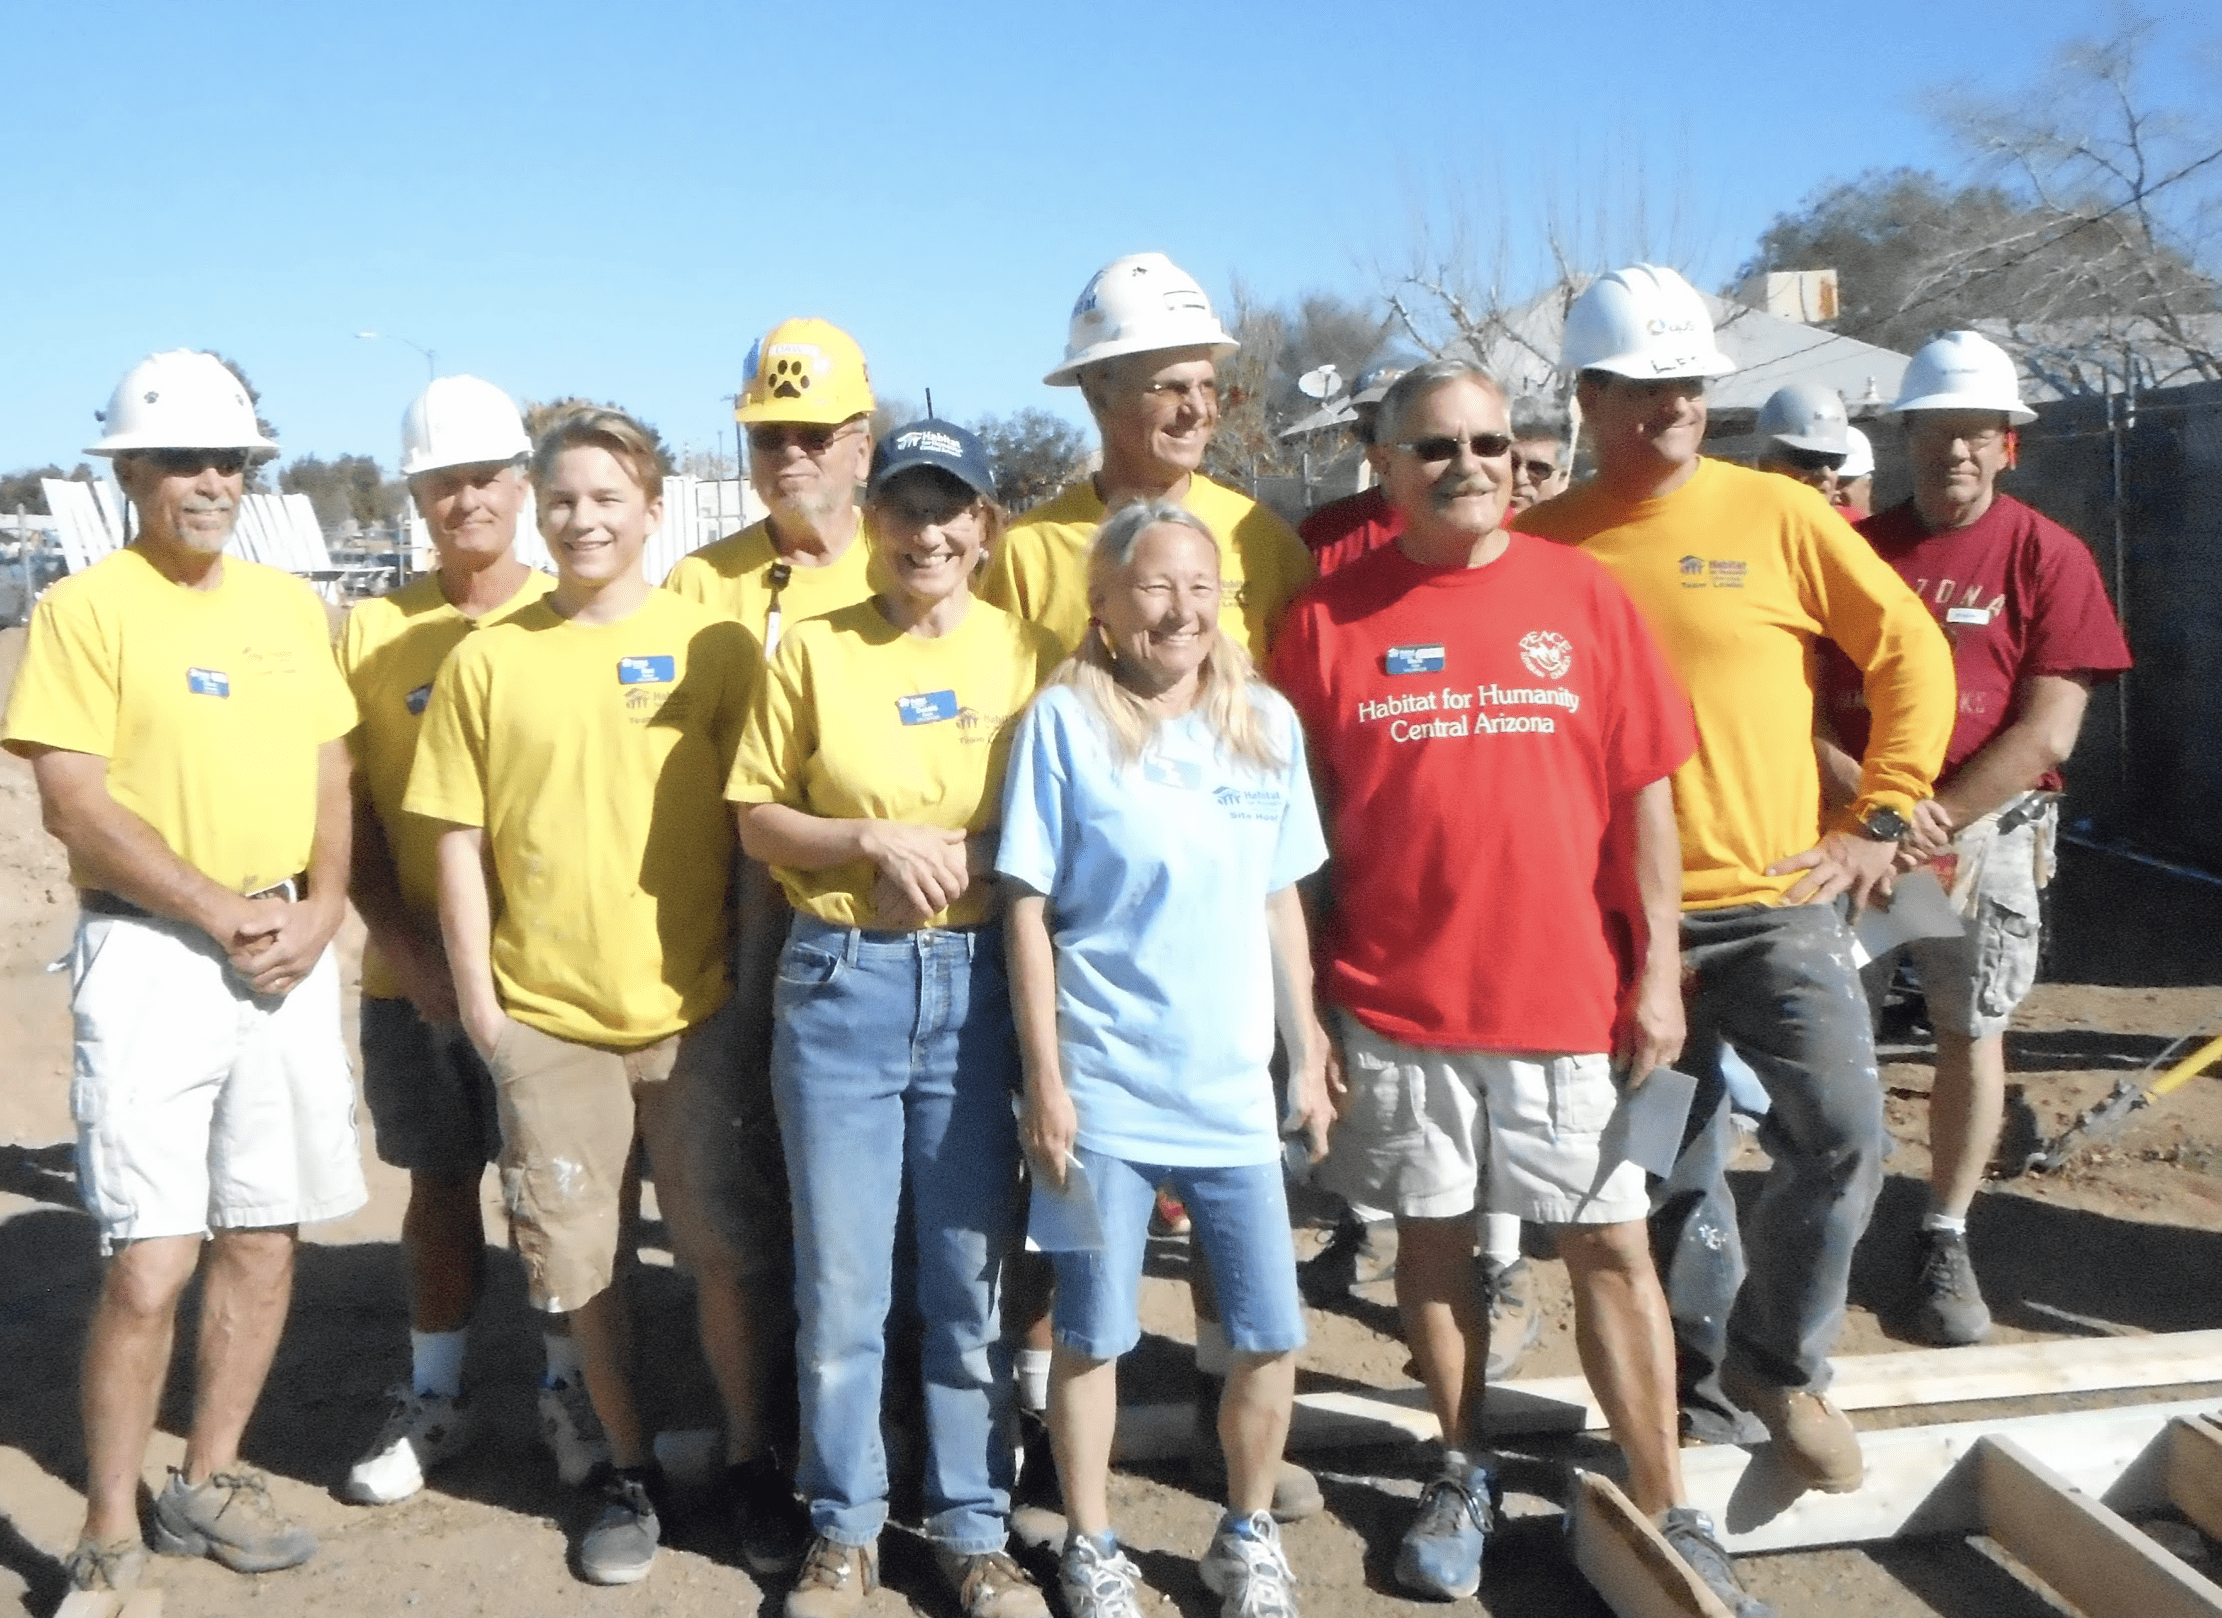 Volunteering is a labor of love